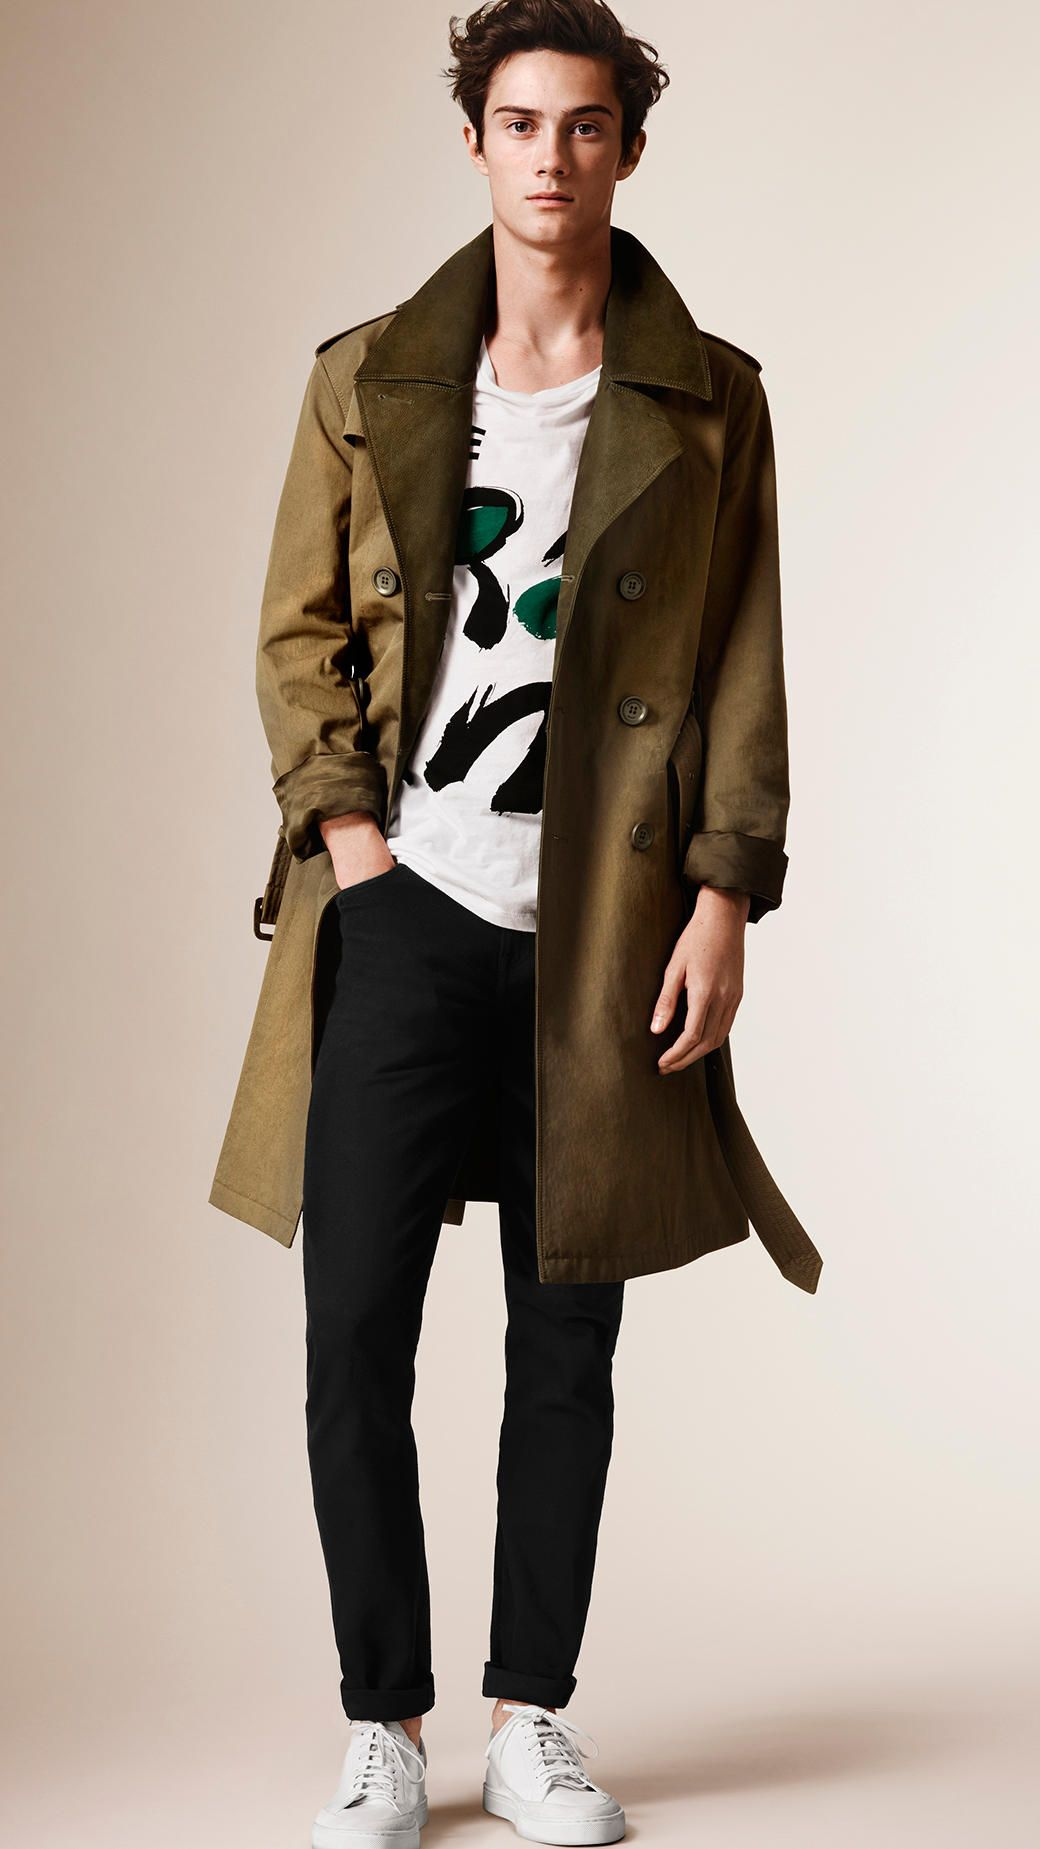 Trench Coats For Men Burberry Trench Coat Men Winter Fashion Casual Mens Coats